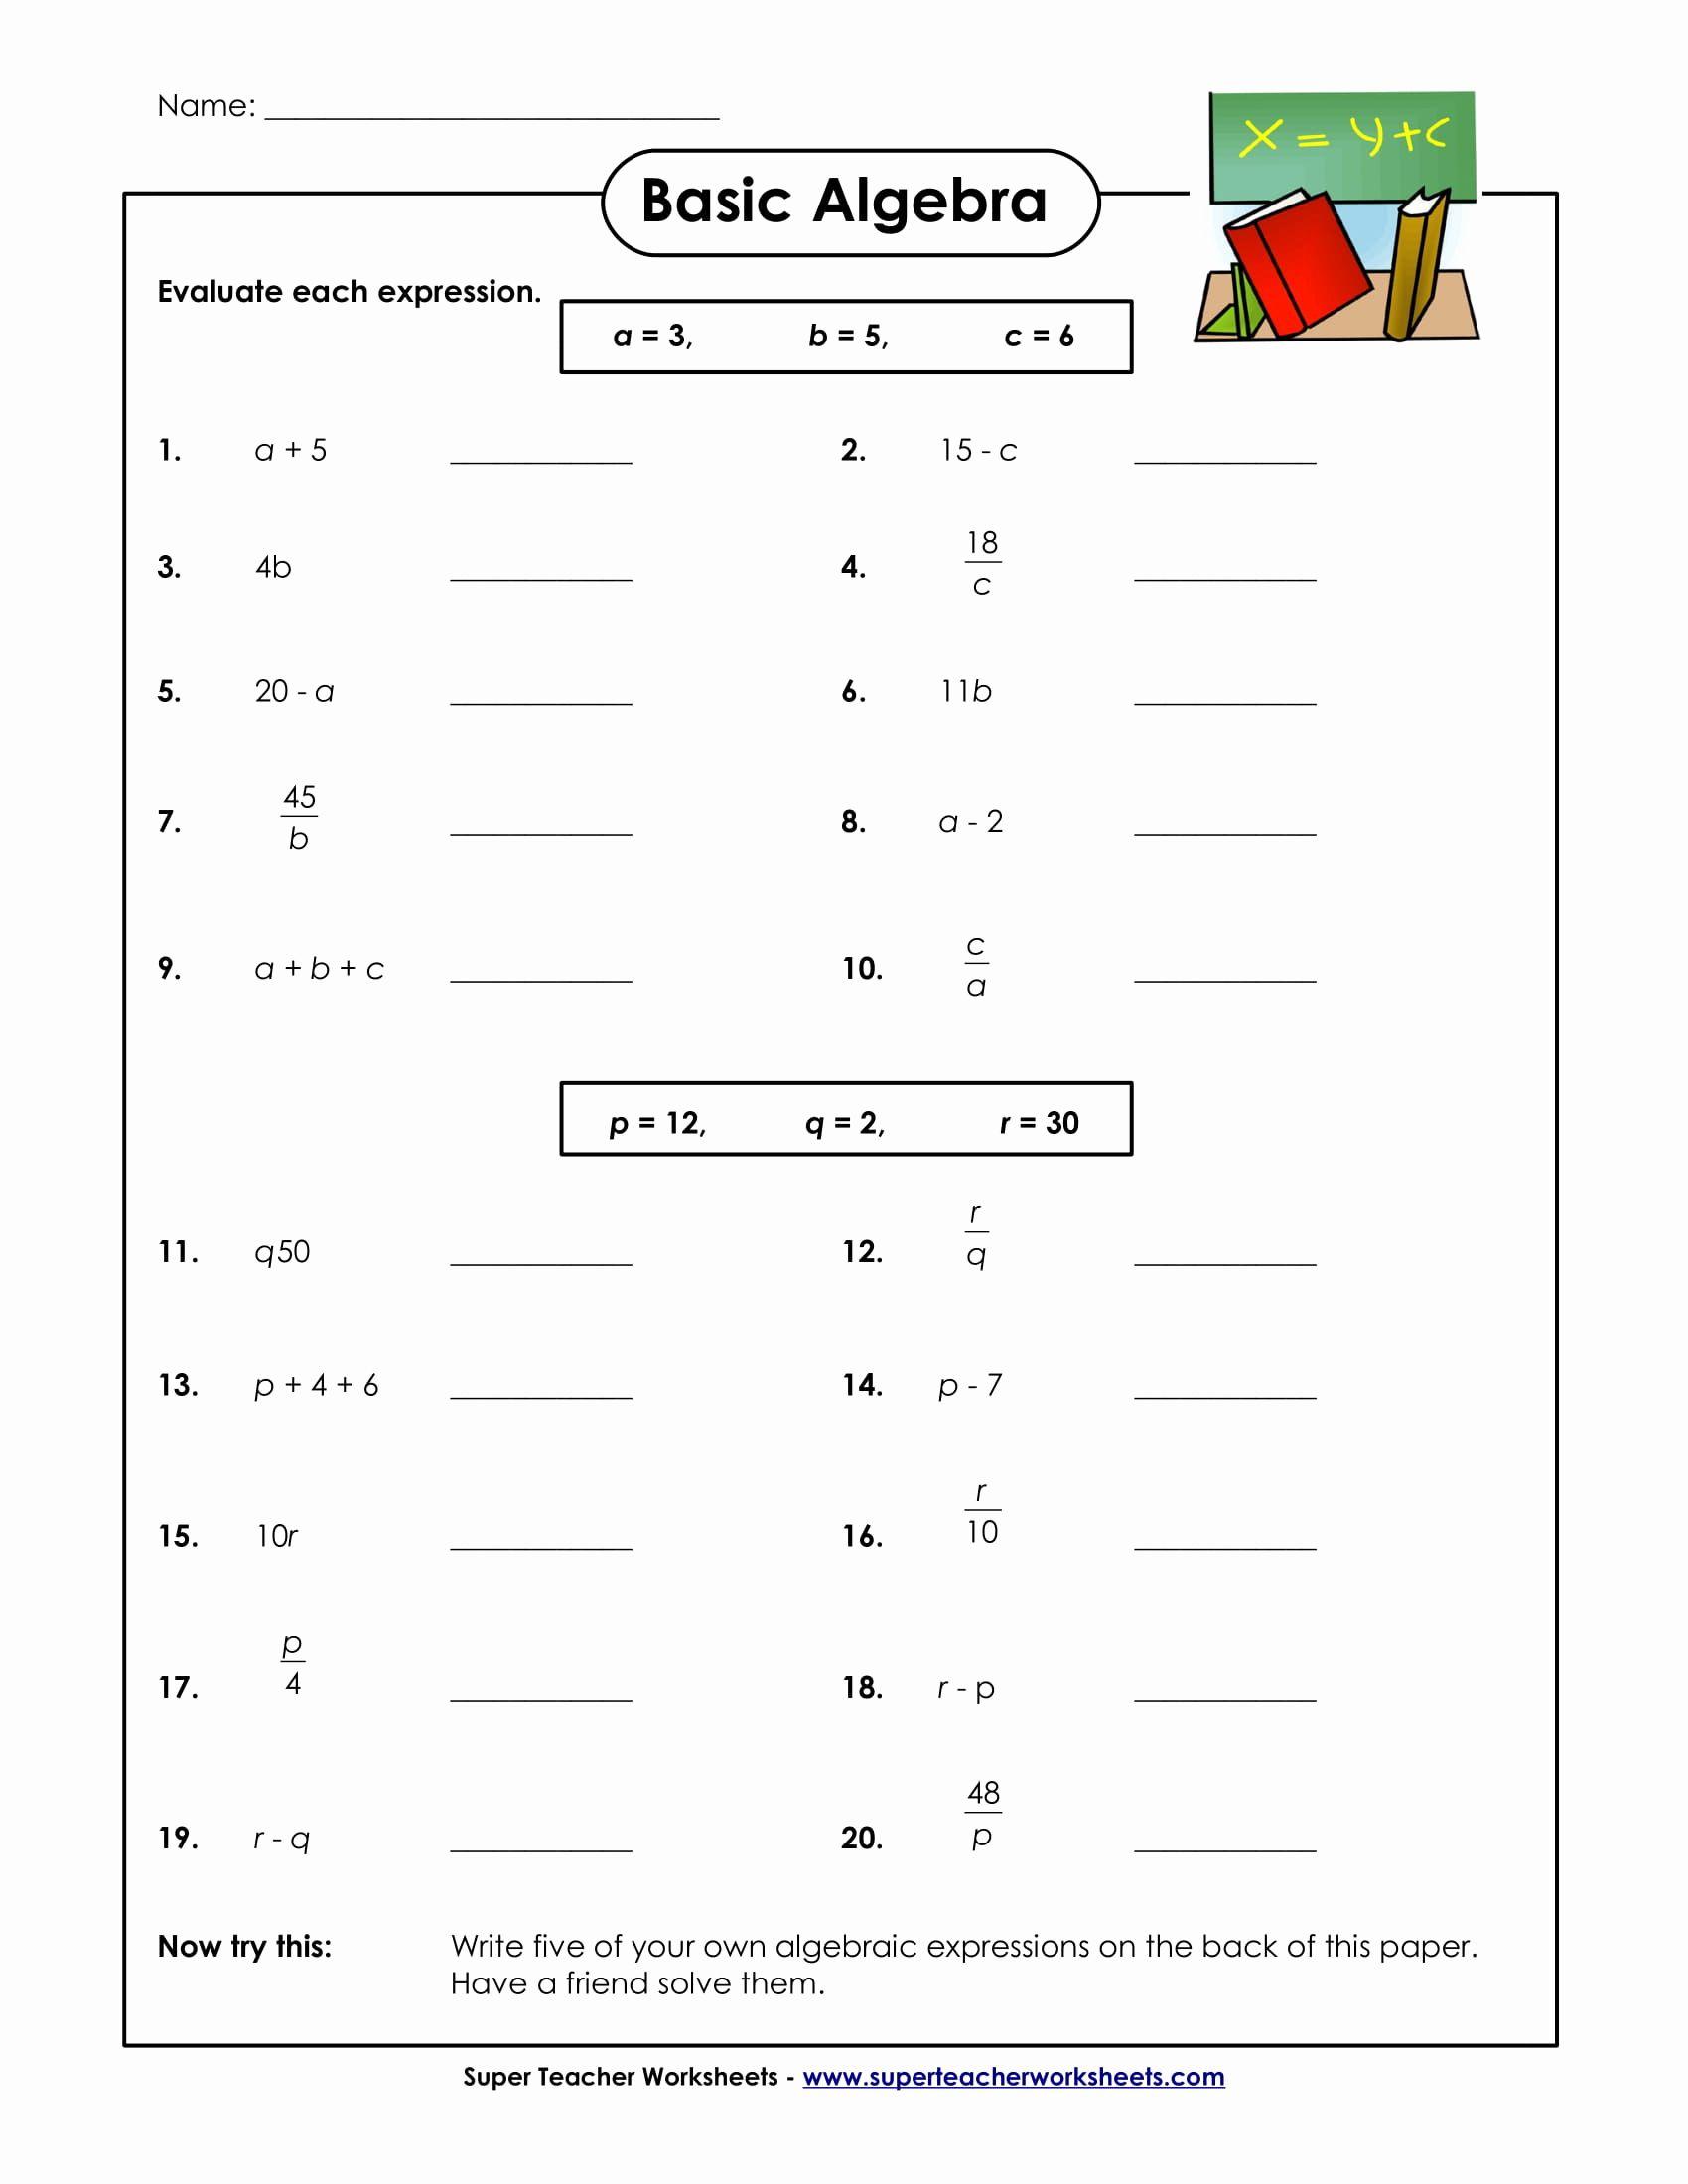 Math Worksheets Algebra In 2020 Math Worksheets Worksheets Algebra